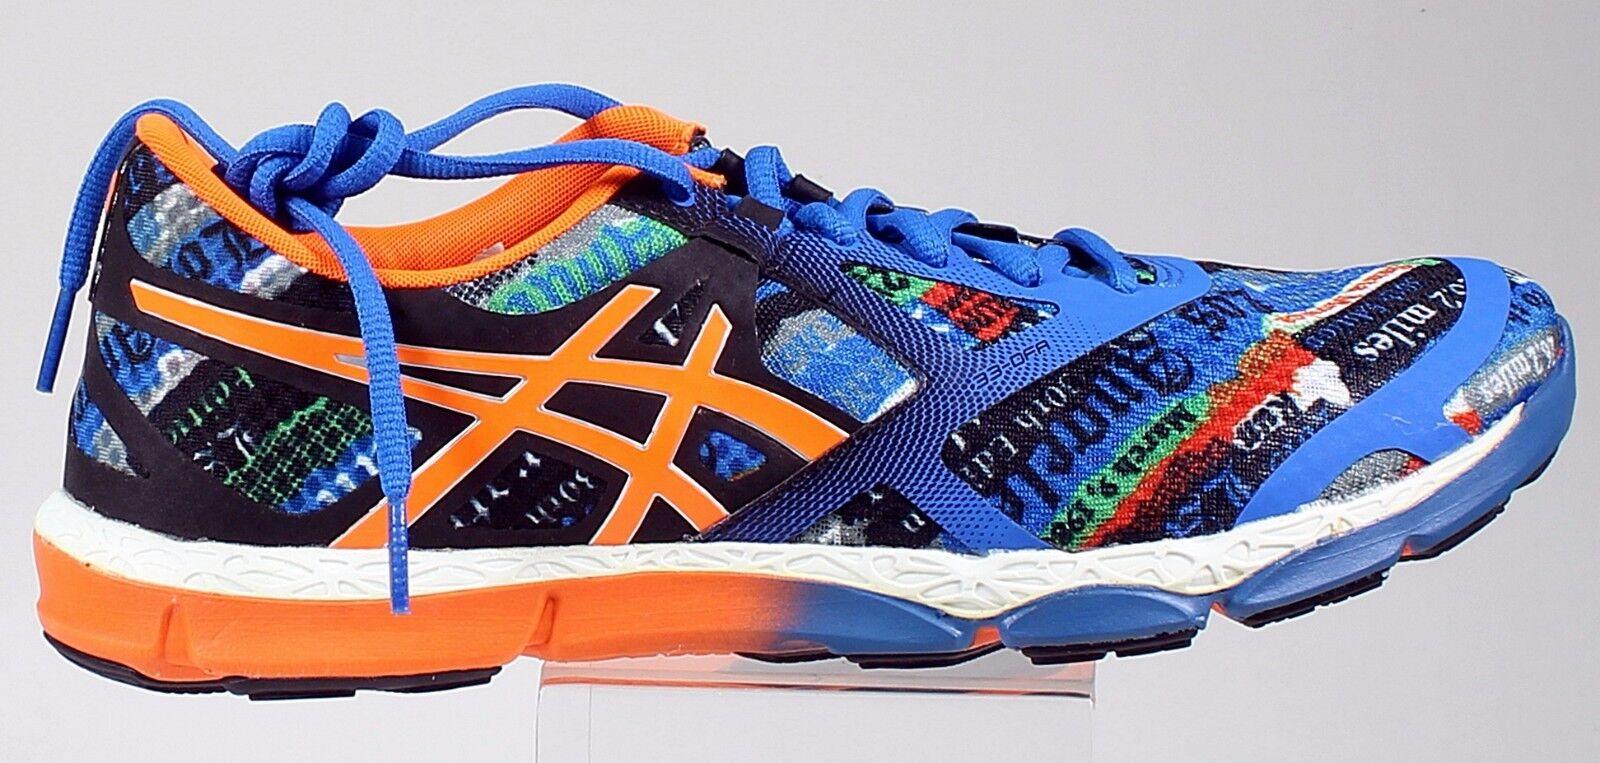 Asics 2015 LA marathon Men's US sizes  running shoes intense graphics graffiti